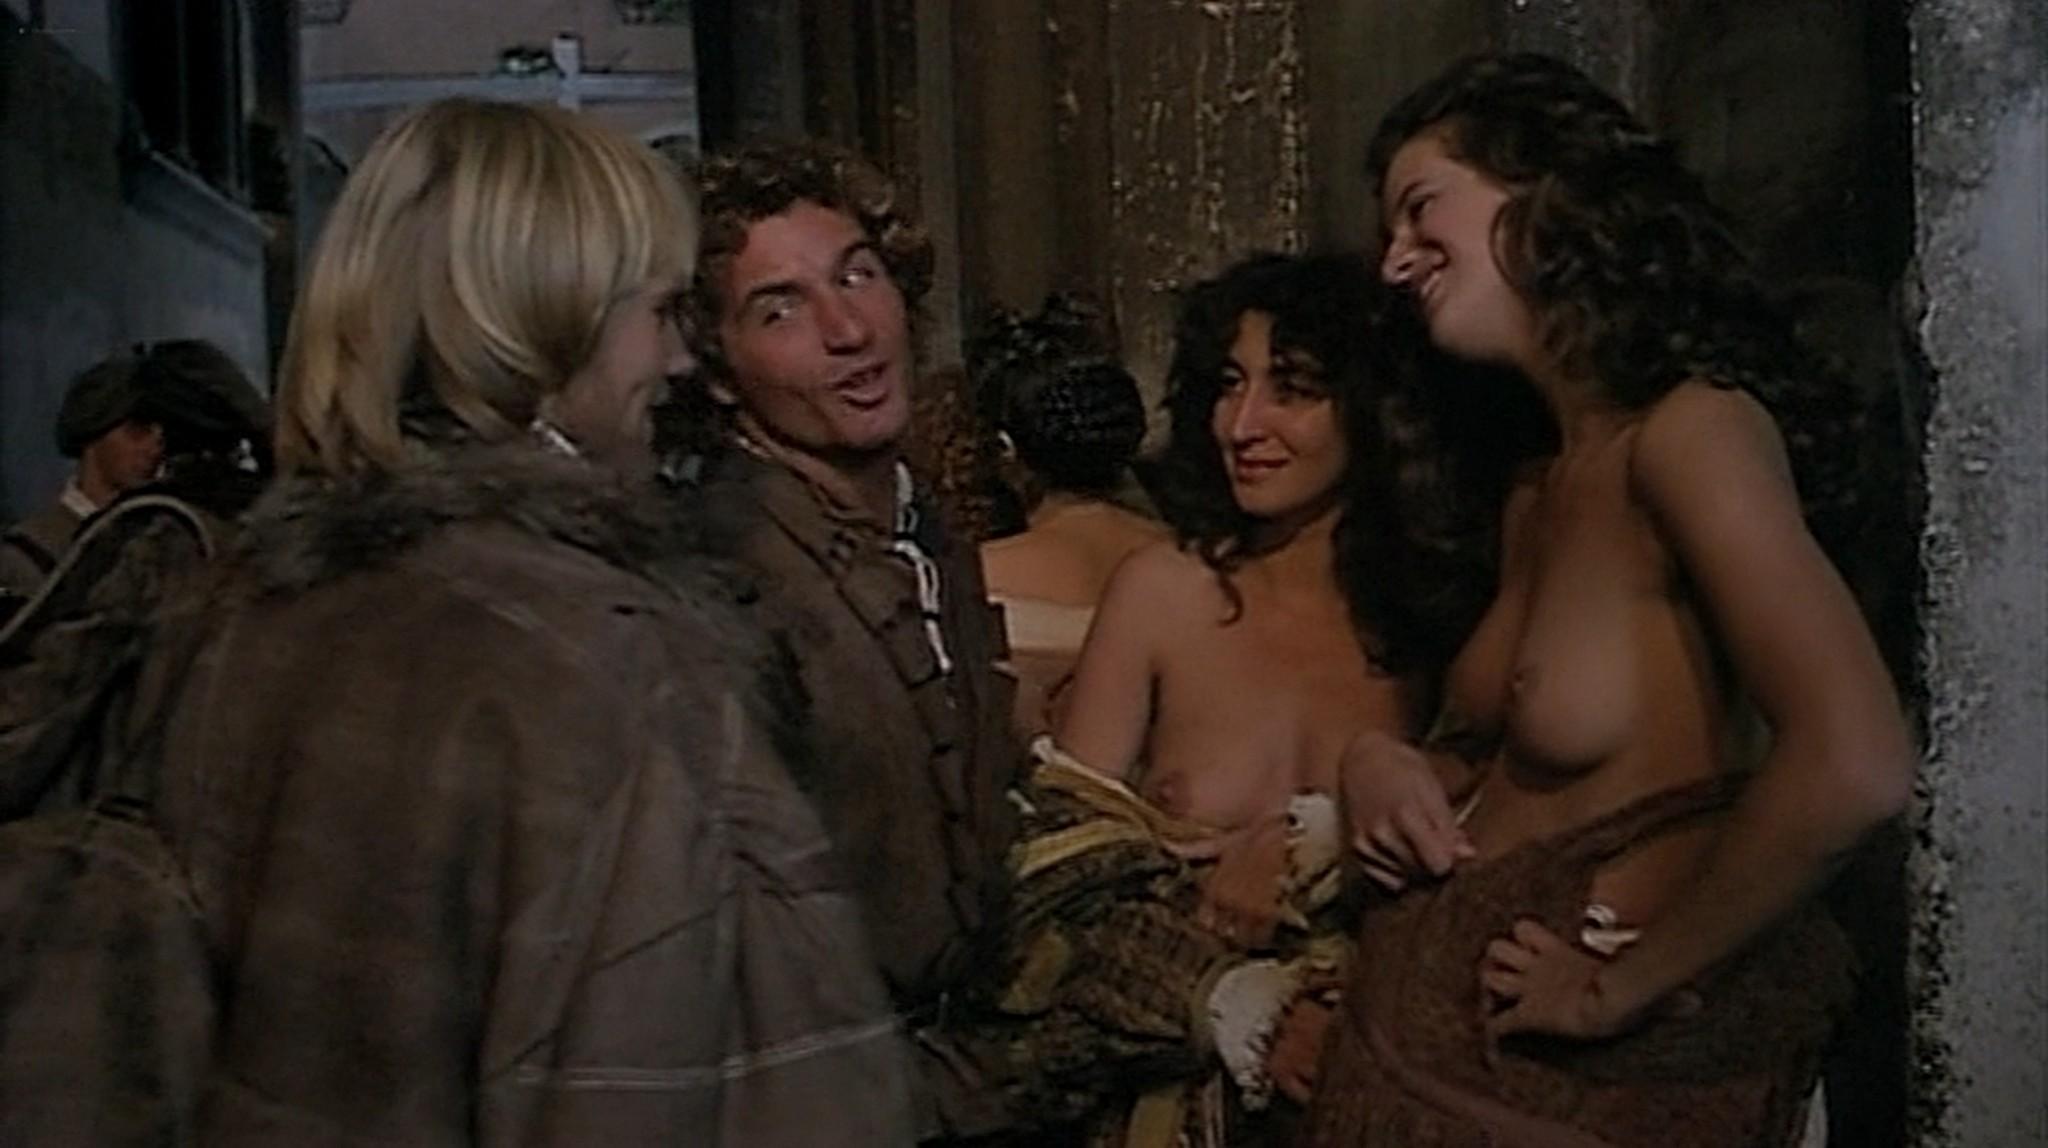 Laura Antonelli nude topless and sex Monica Guerritore nude topless and Clelia Rondinella nude lesbian sex La Venexiana 1986 DVDRip 2